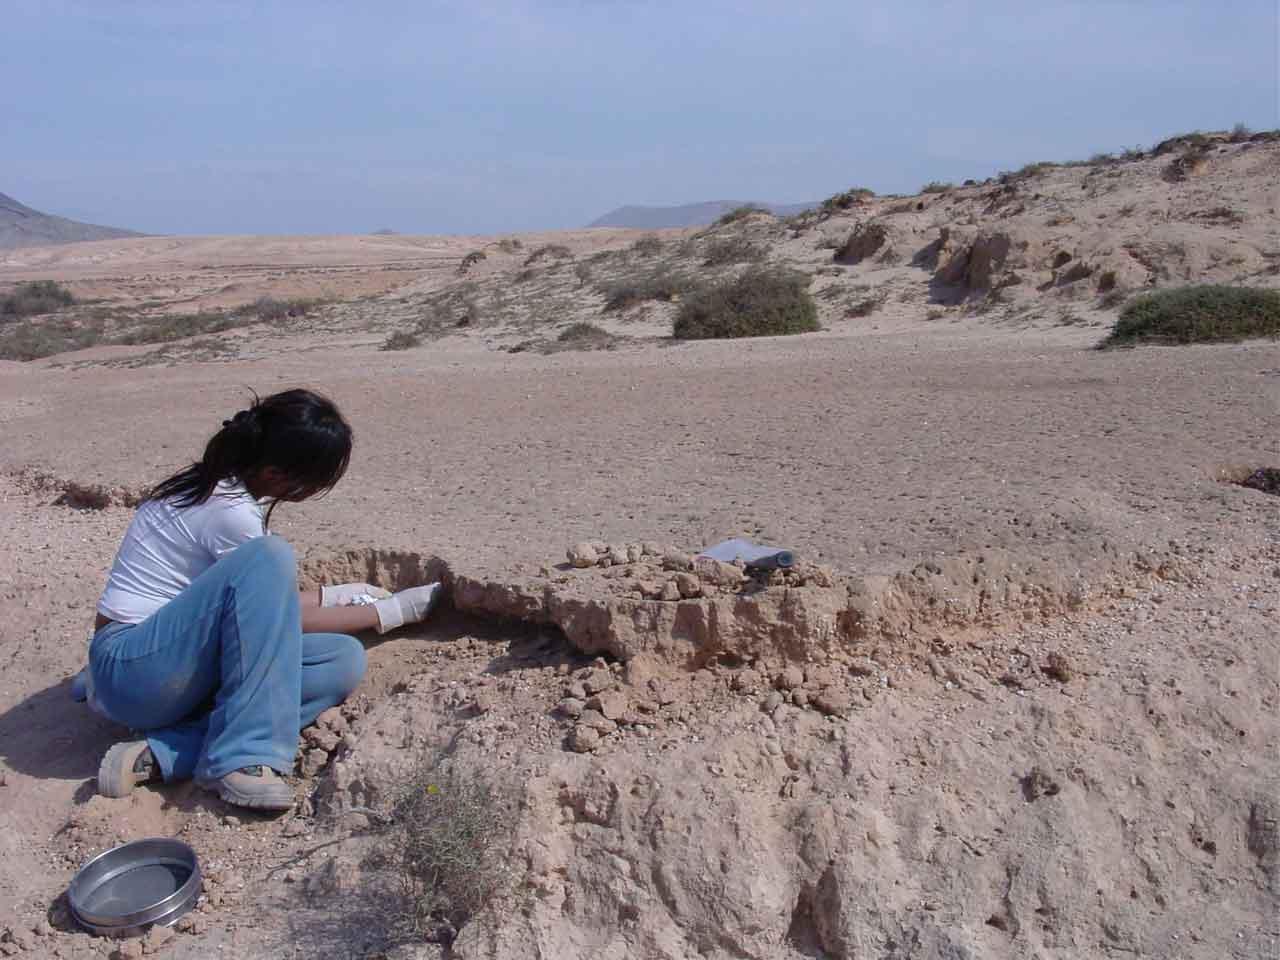 Yanes_field-_Fuerteventura-Island-lo-rez.jpg